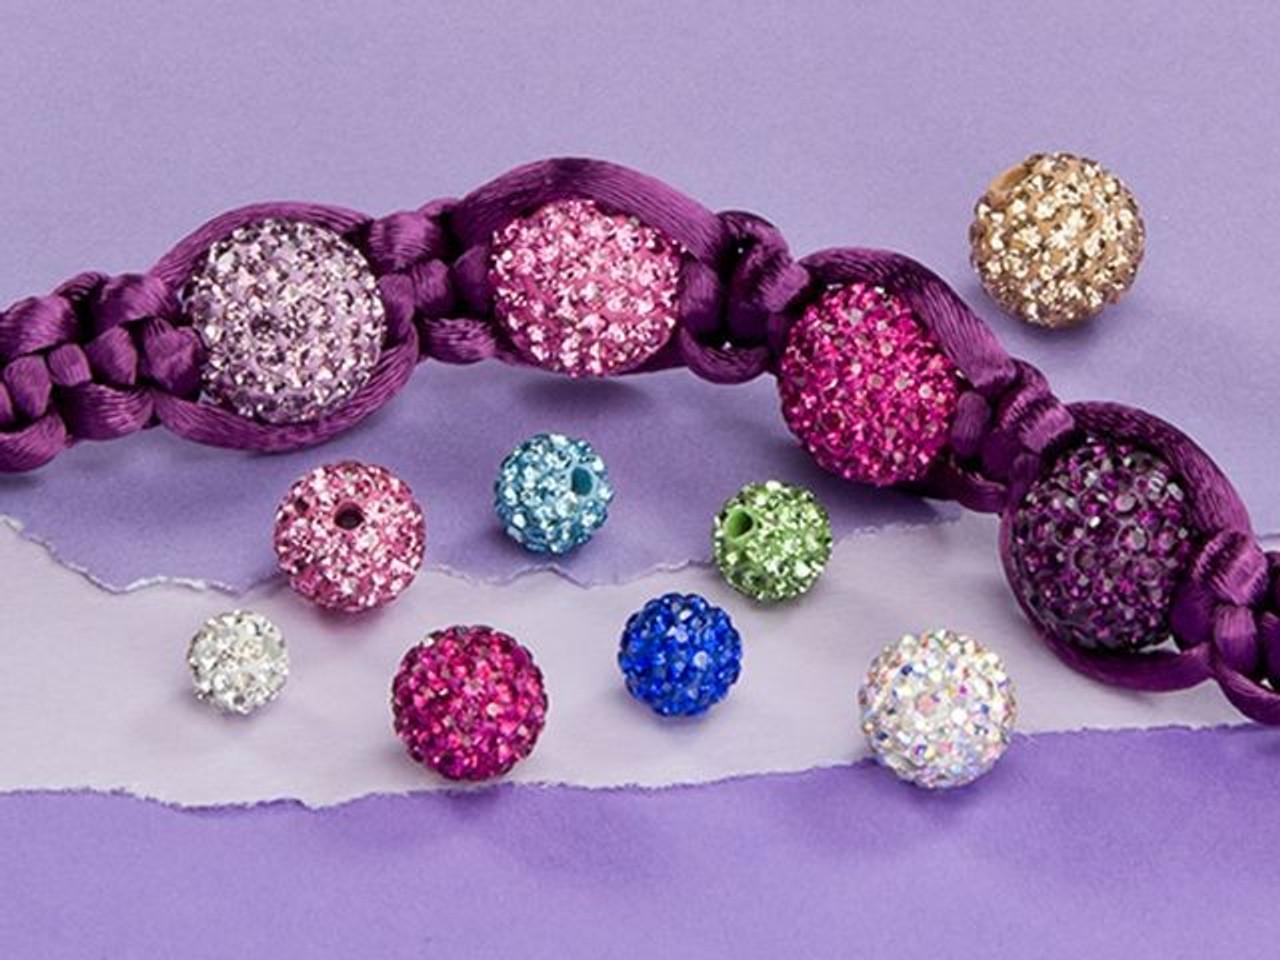 Porcelain Oval Beads 8 x 10mm White//Violet 10 Pcs Art Hobby DIY Jewellery Making